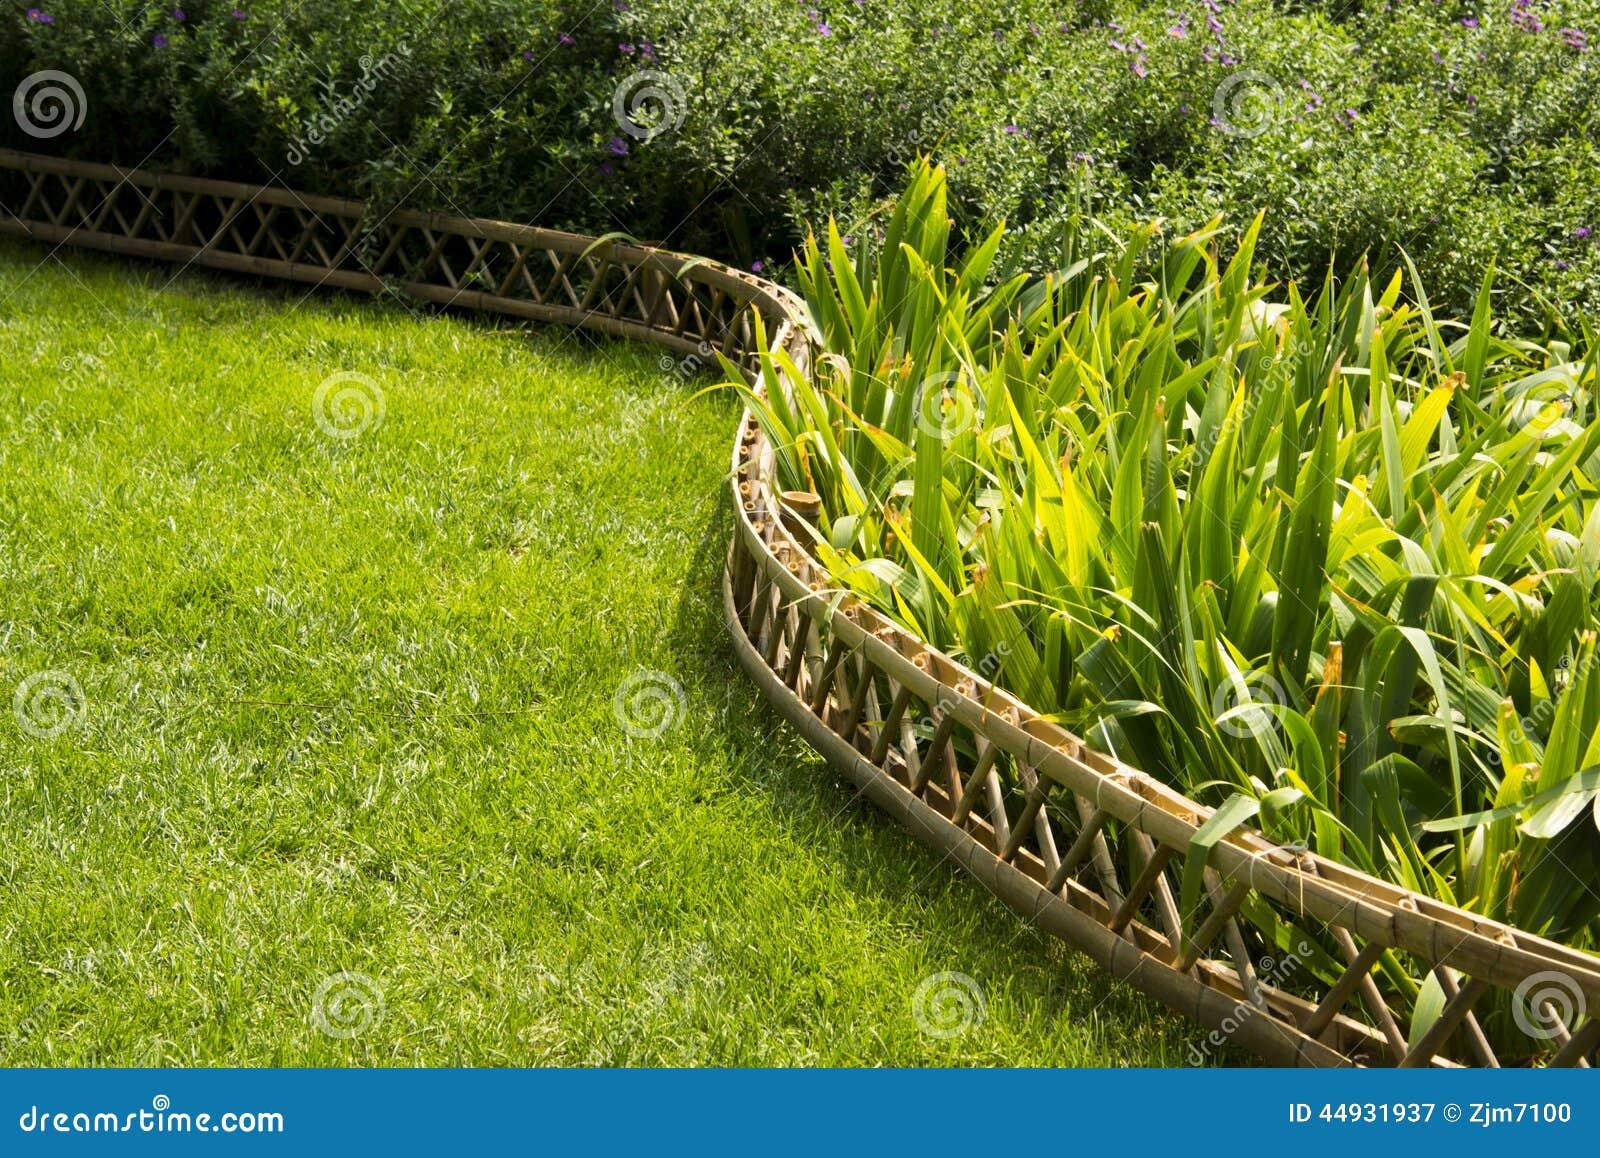 Pelouse, Barrière En Bambou Image stock - Image du horizontal, forme ...